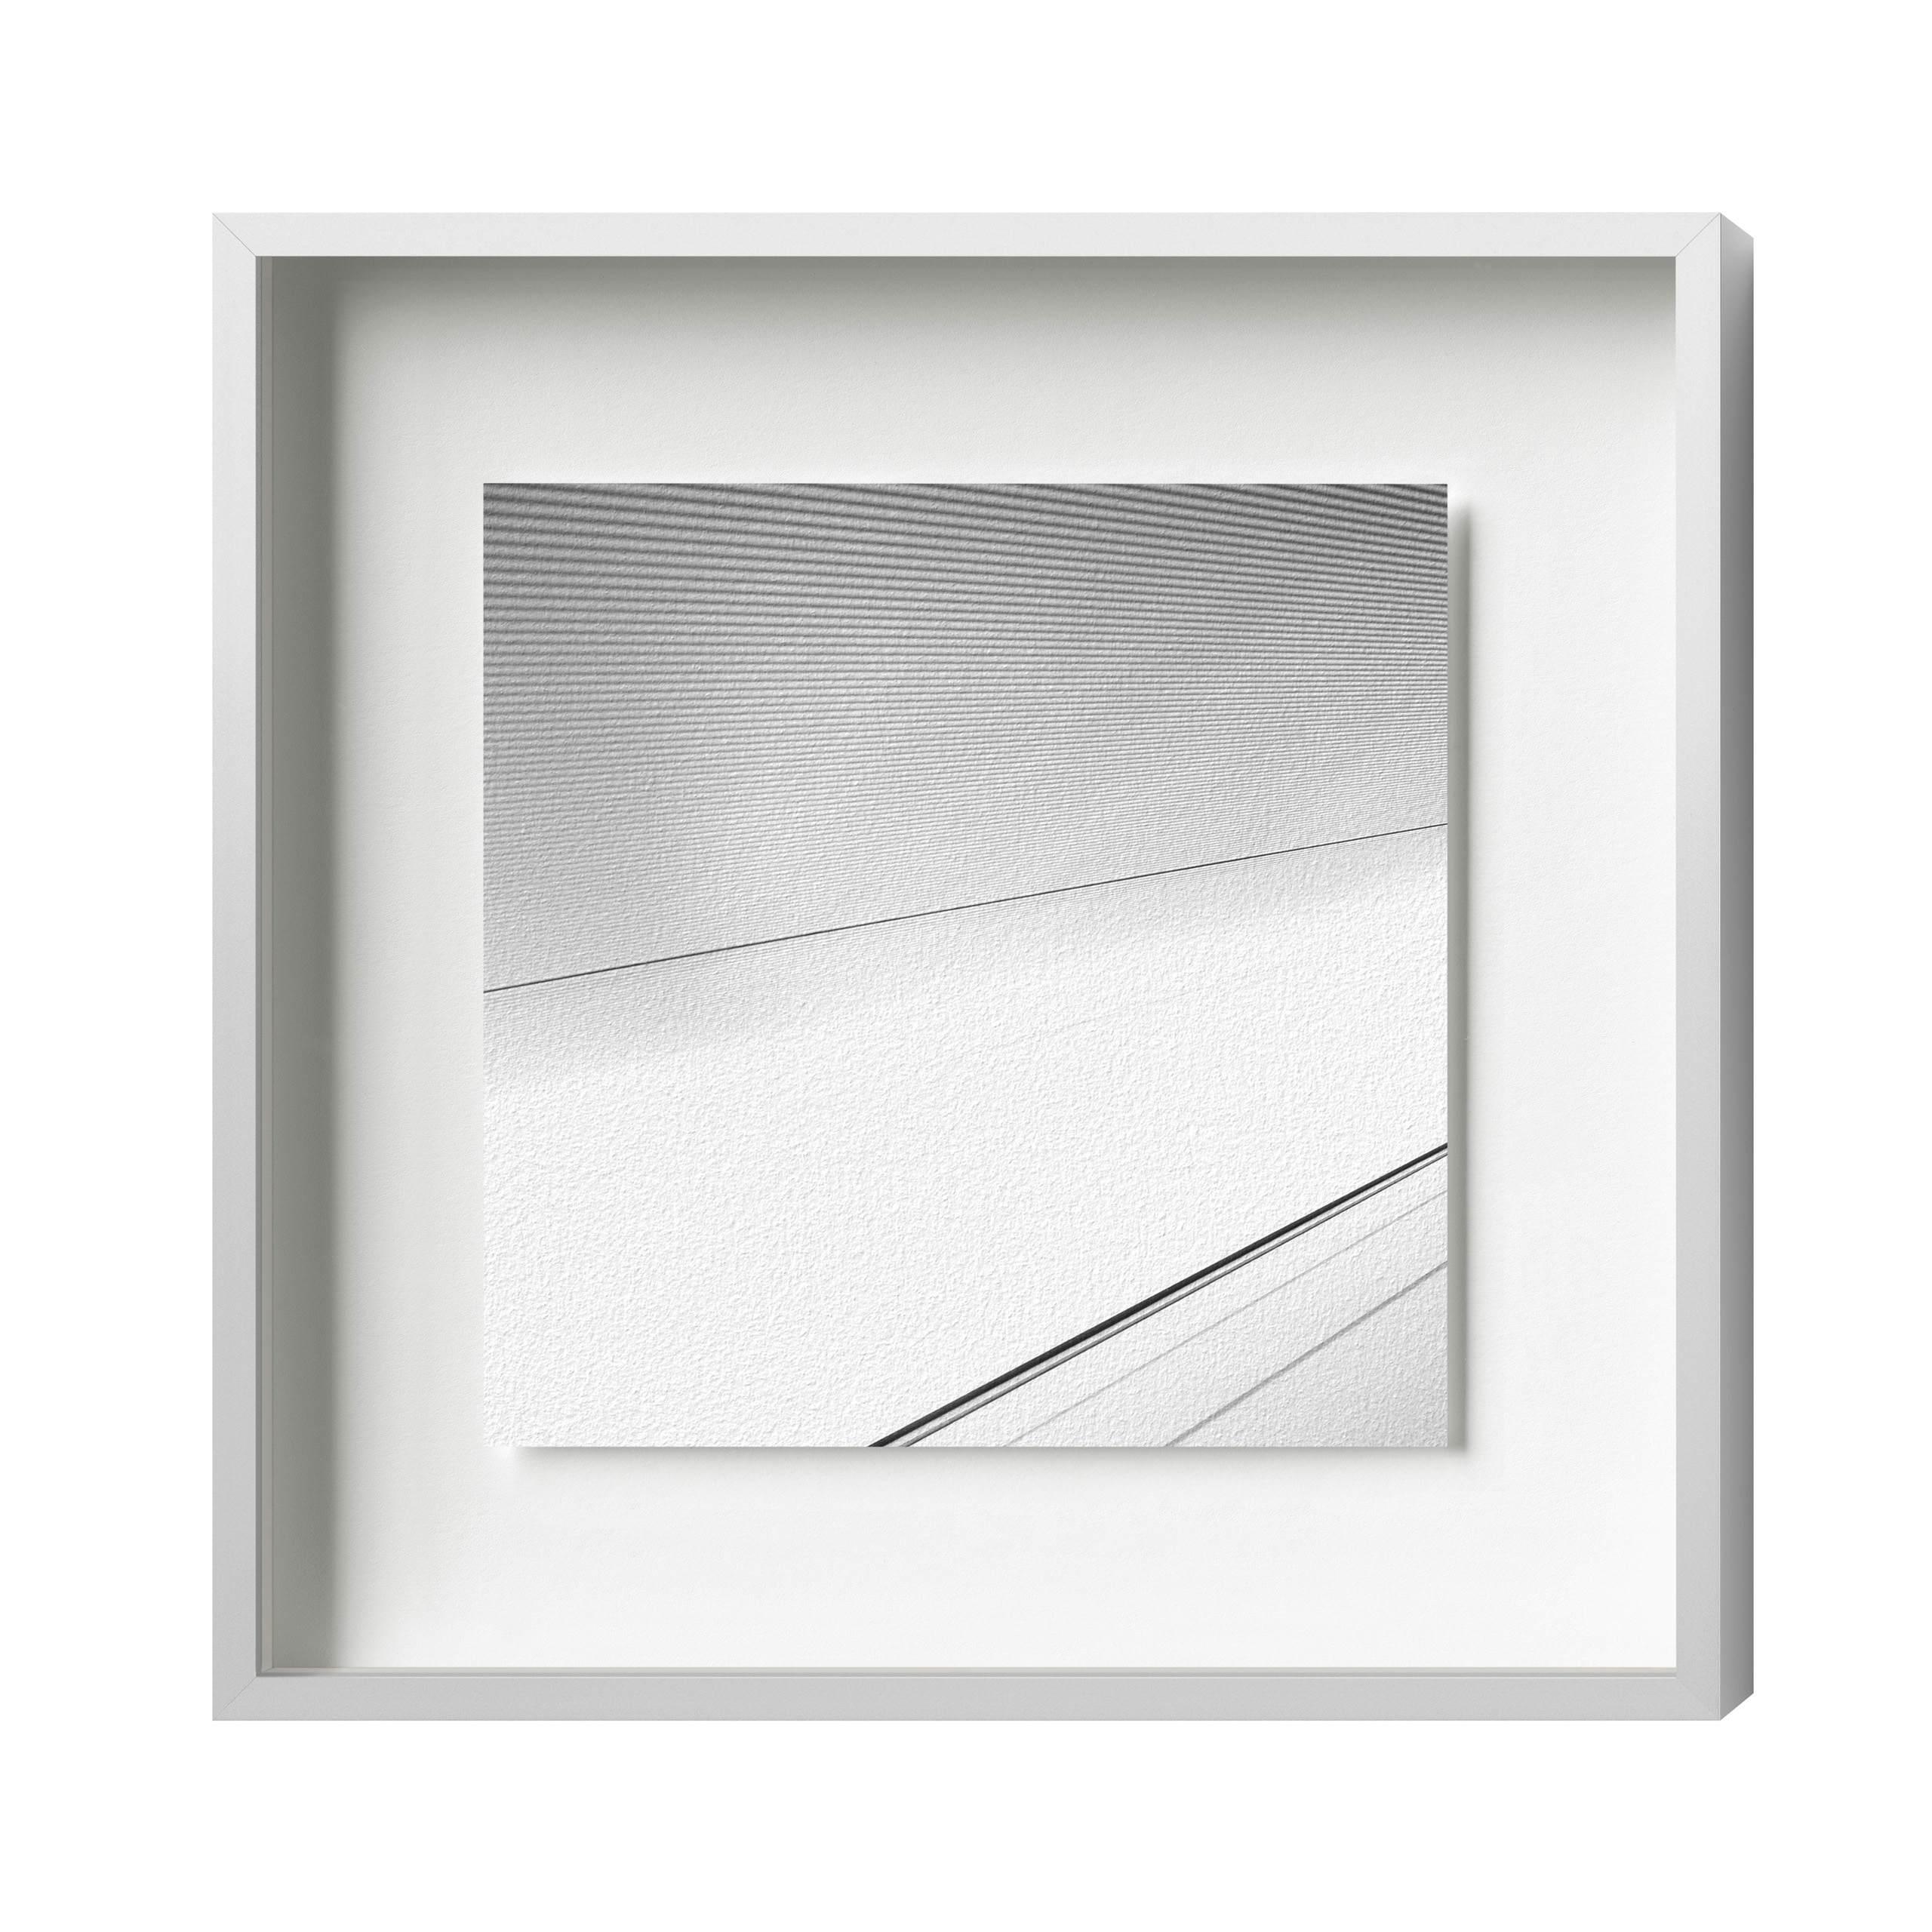 Distance 10 Alu 8, Silber matt, Normalglas glä., 210 x 210 | HALBE ...